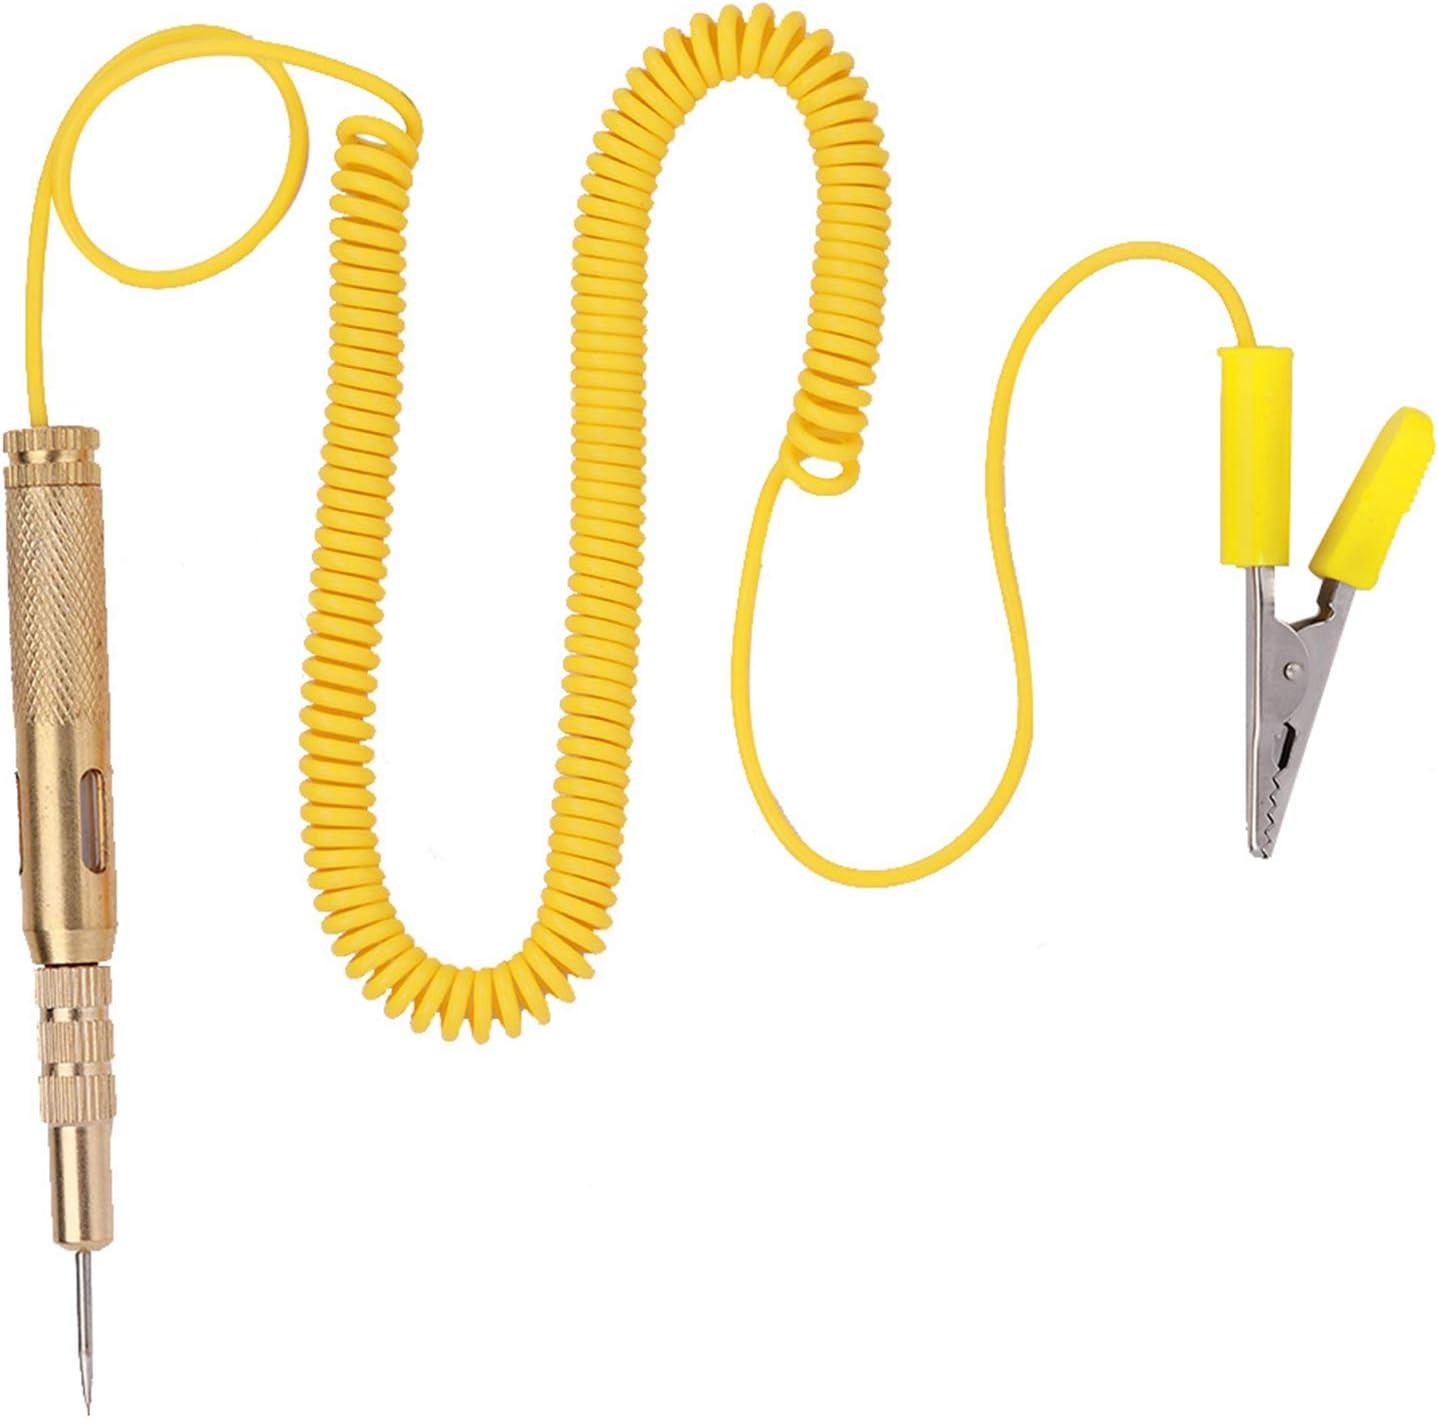 Nannigr shopping Circuit Tester Pen Light Pencil Bulb Inventory cleanup selling sale Aut